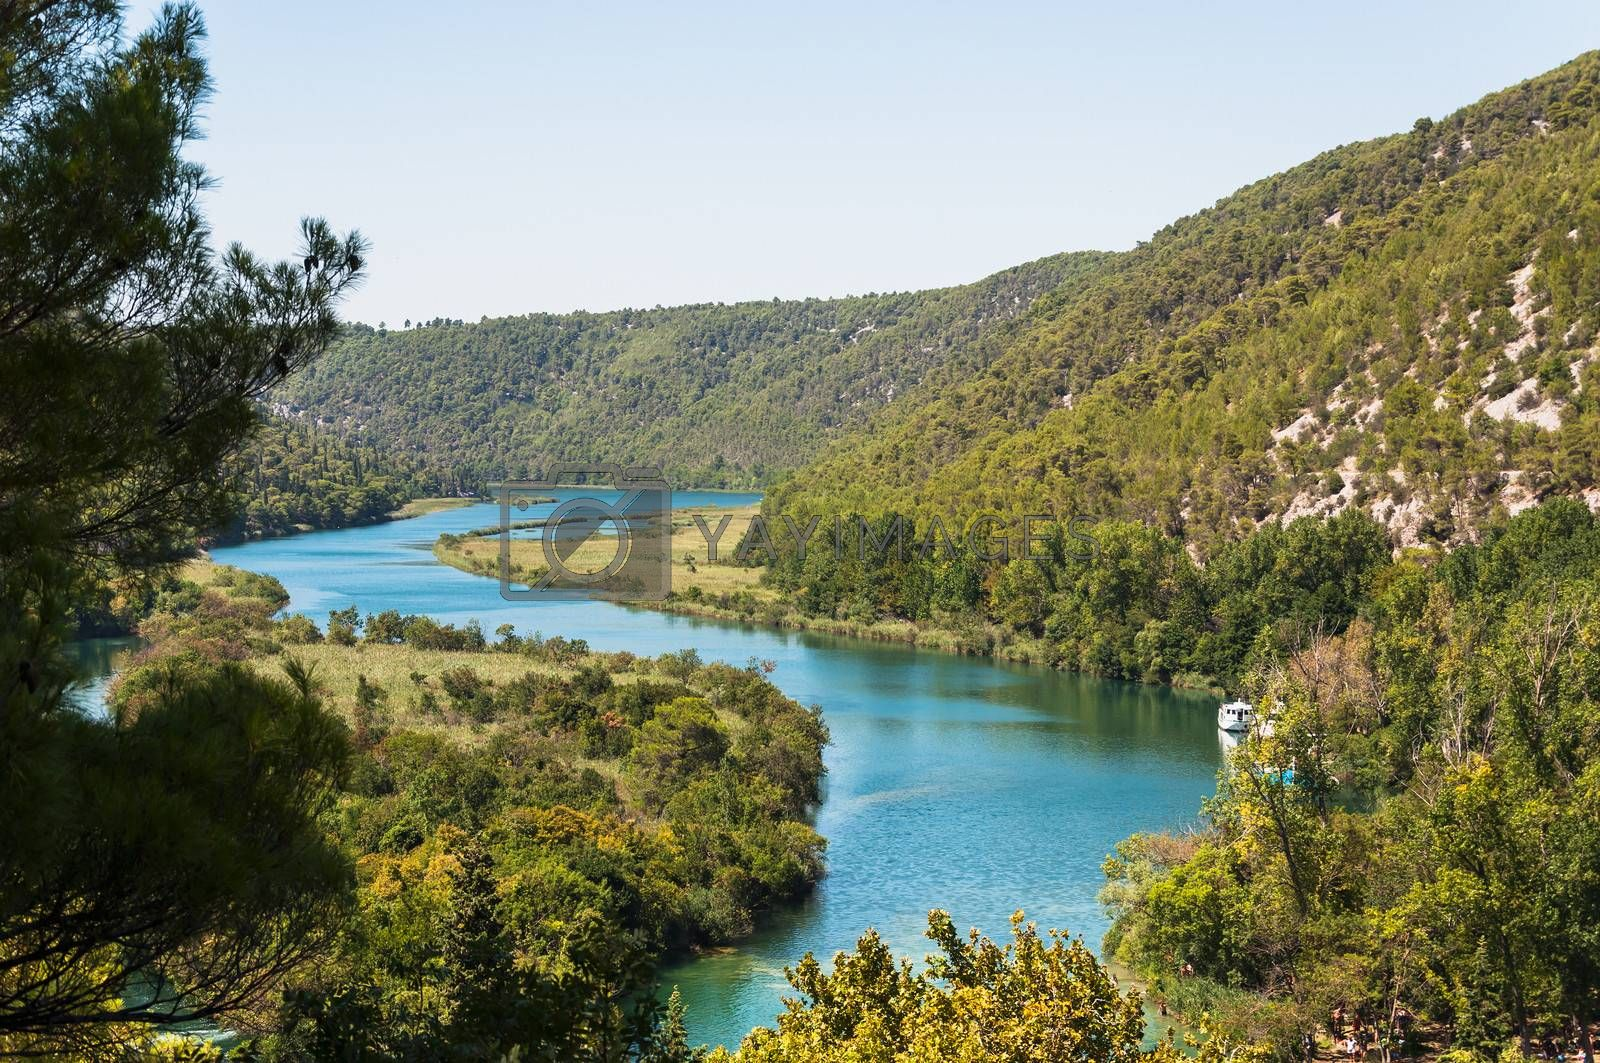 Krka River in Krka National Park, Croatia